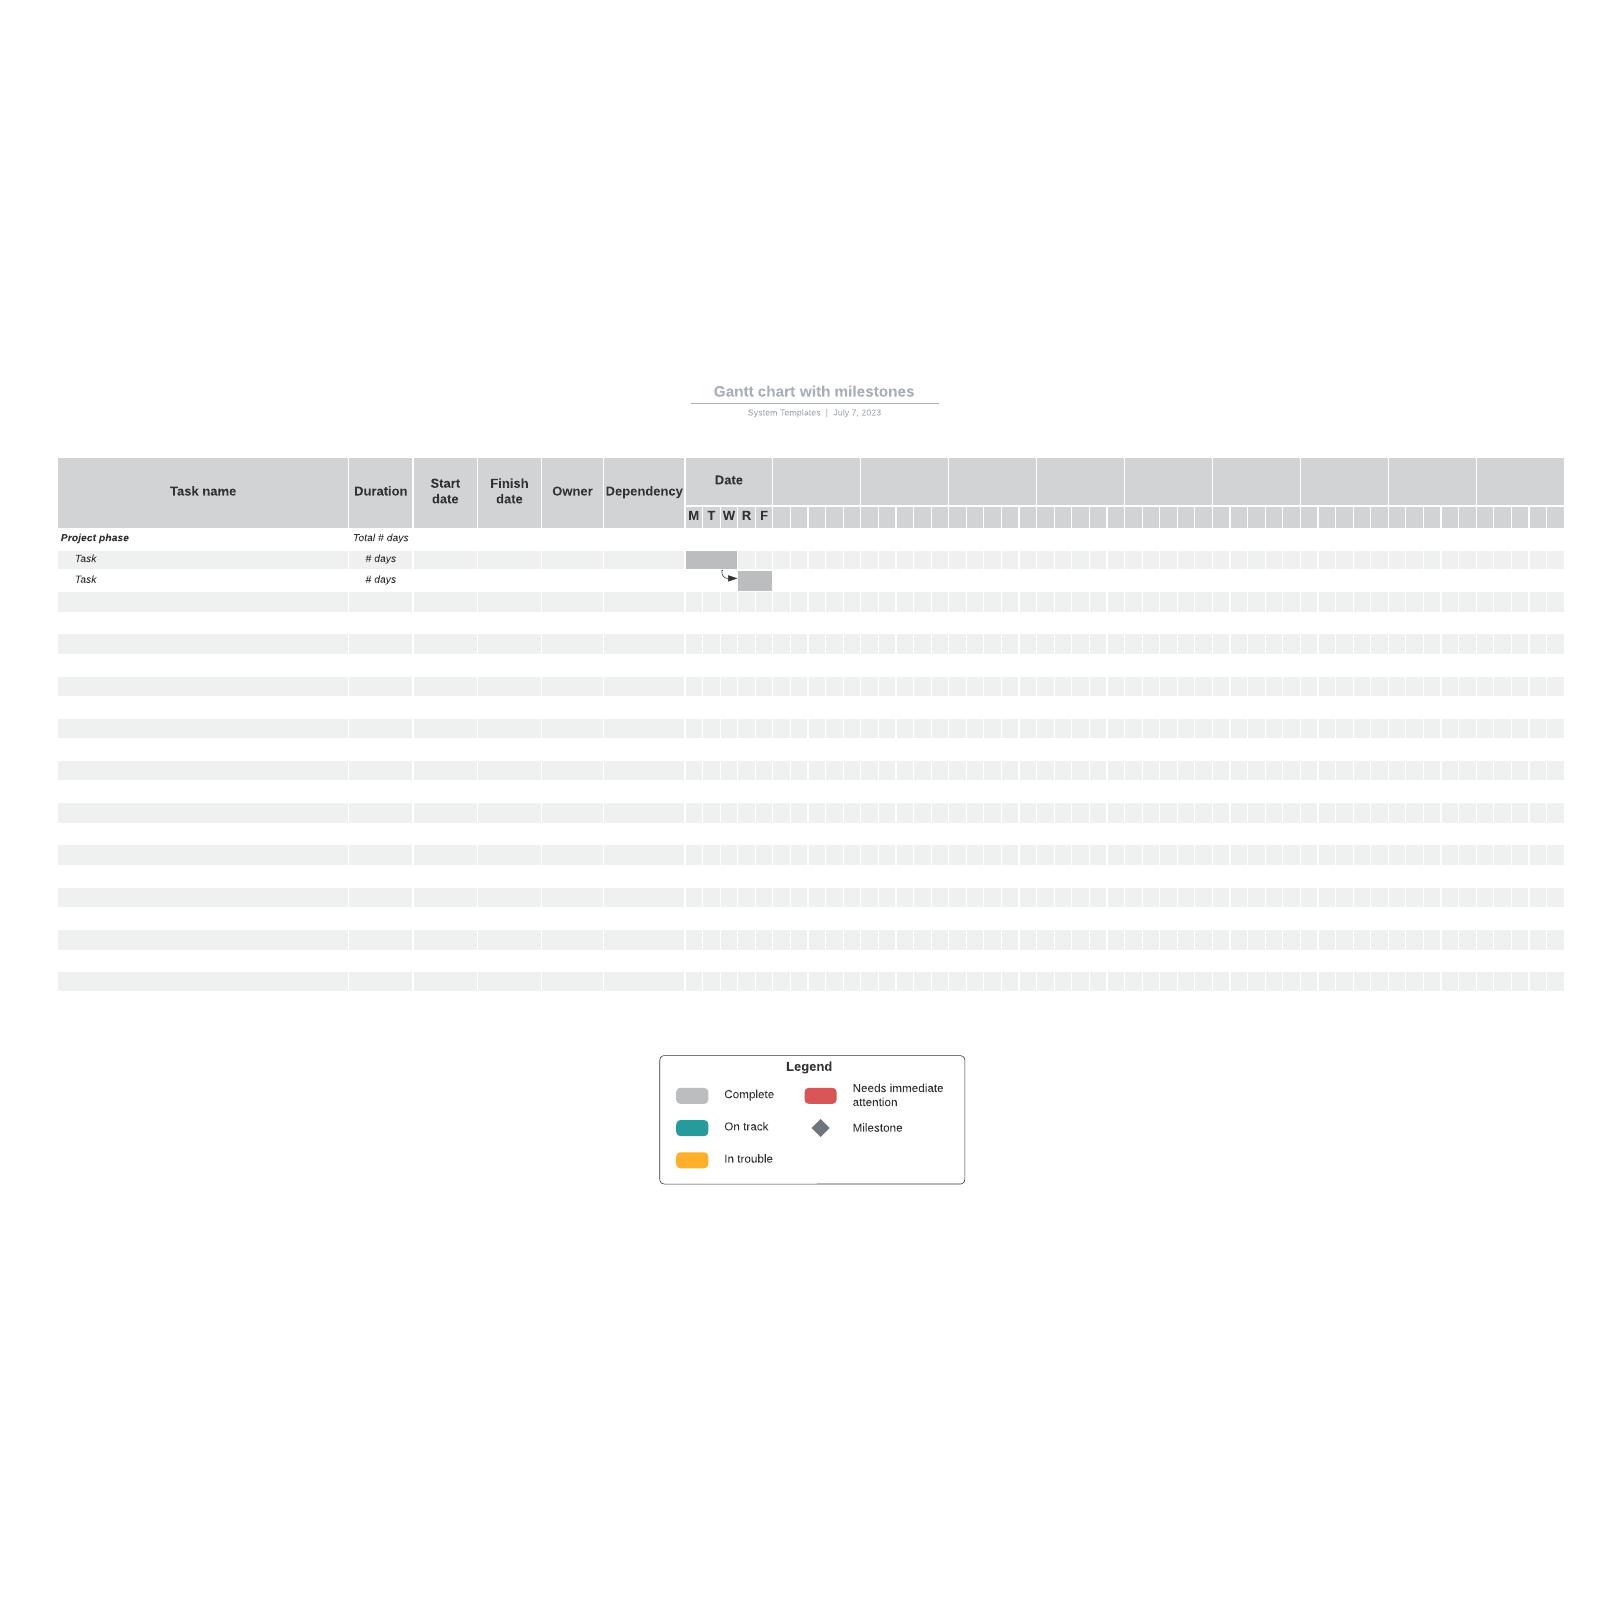 Gantt chart with milestones